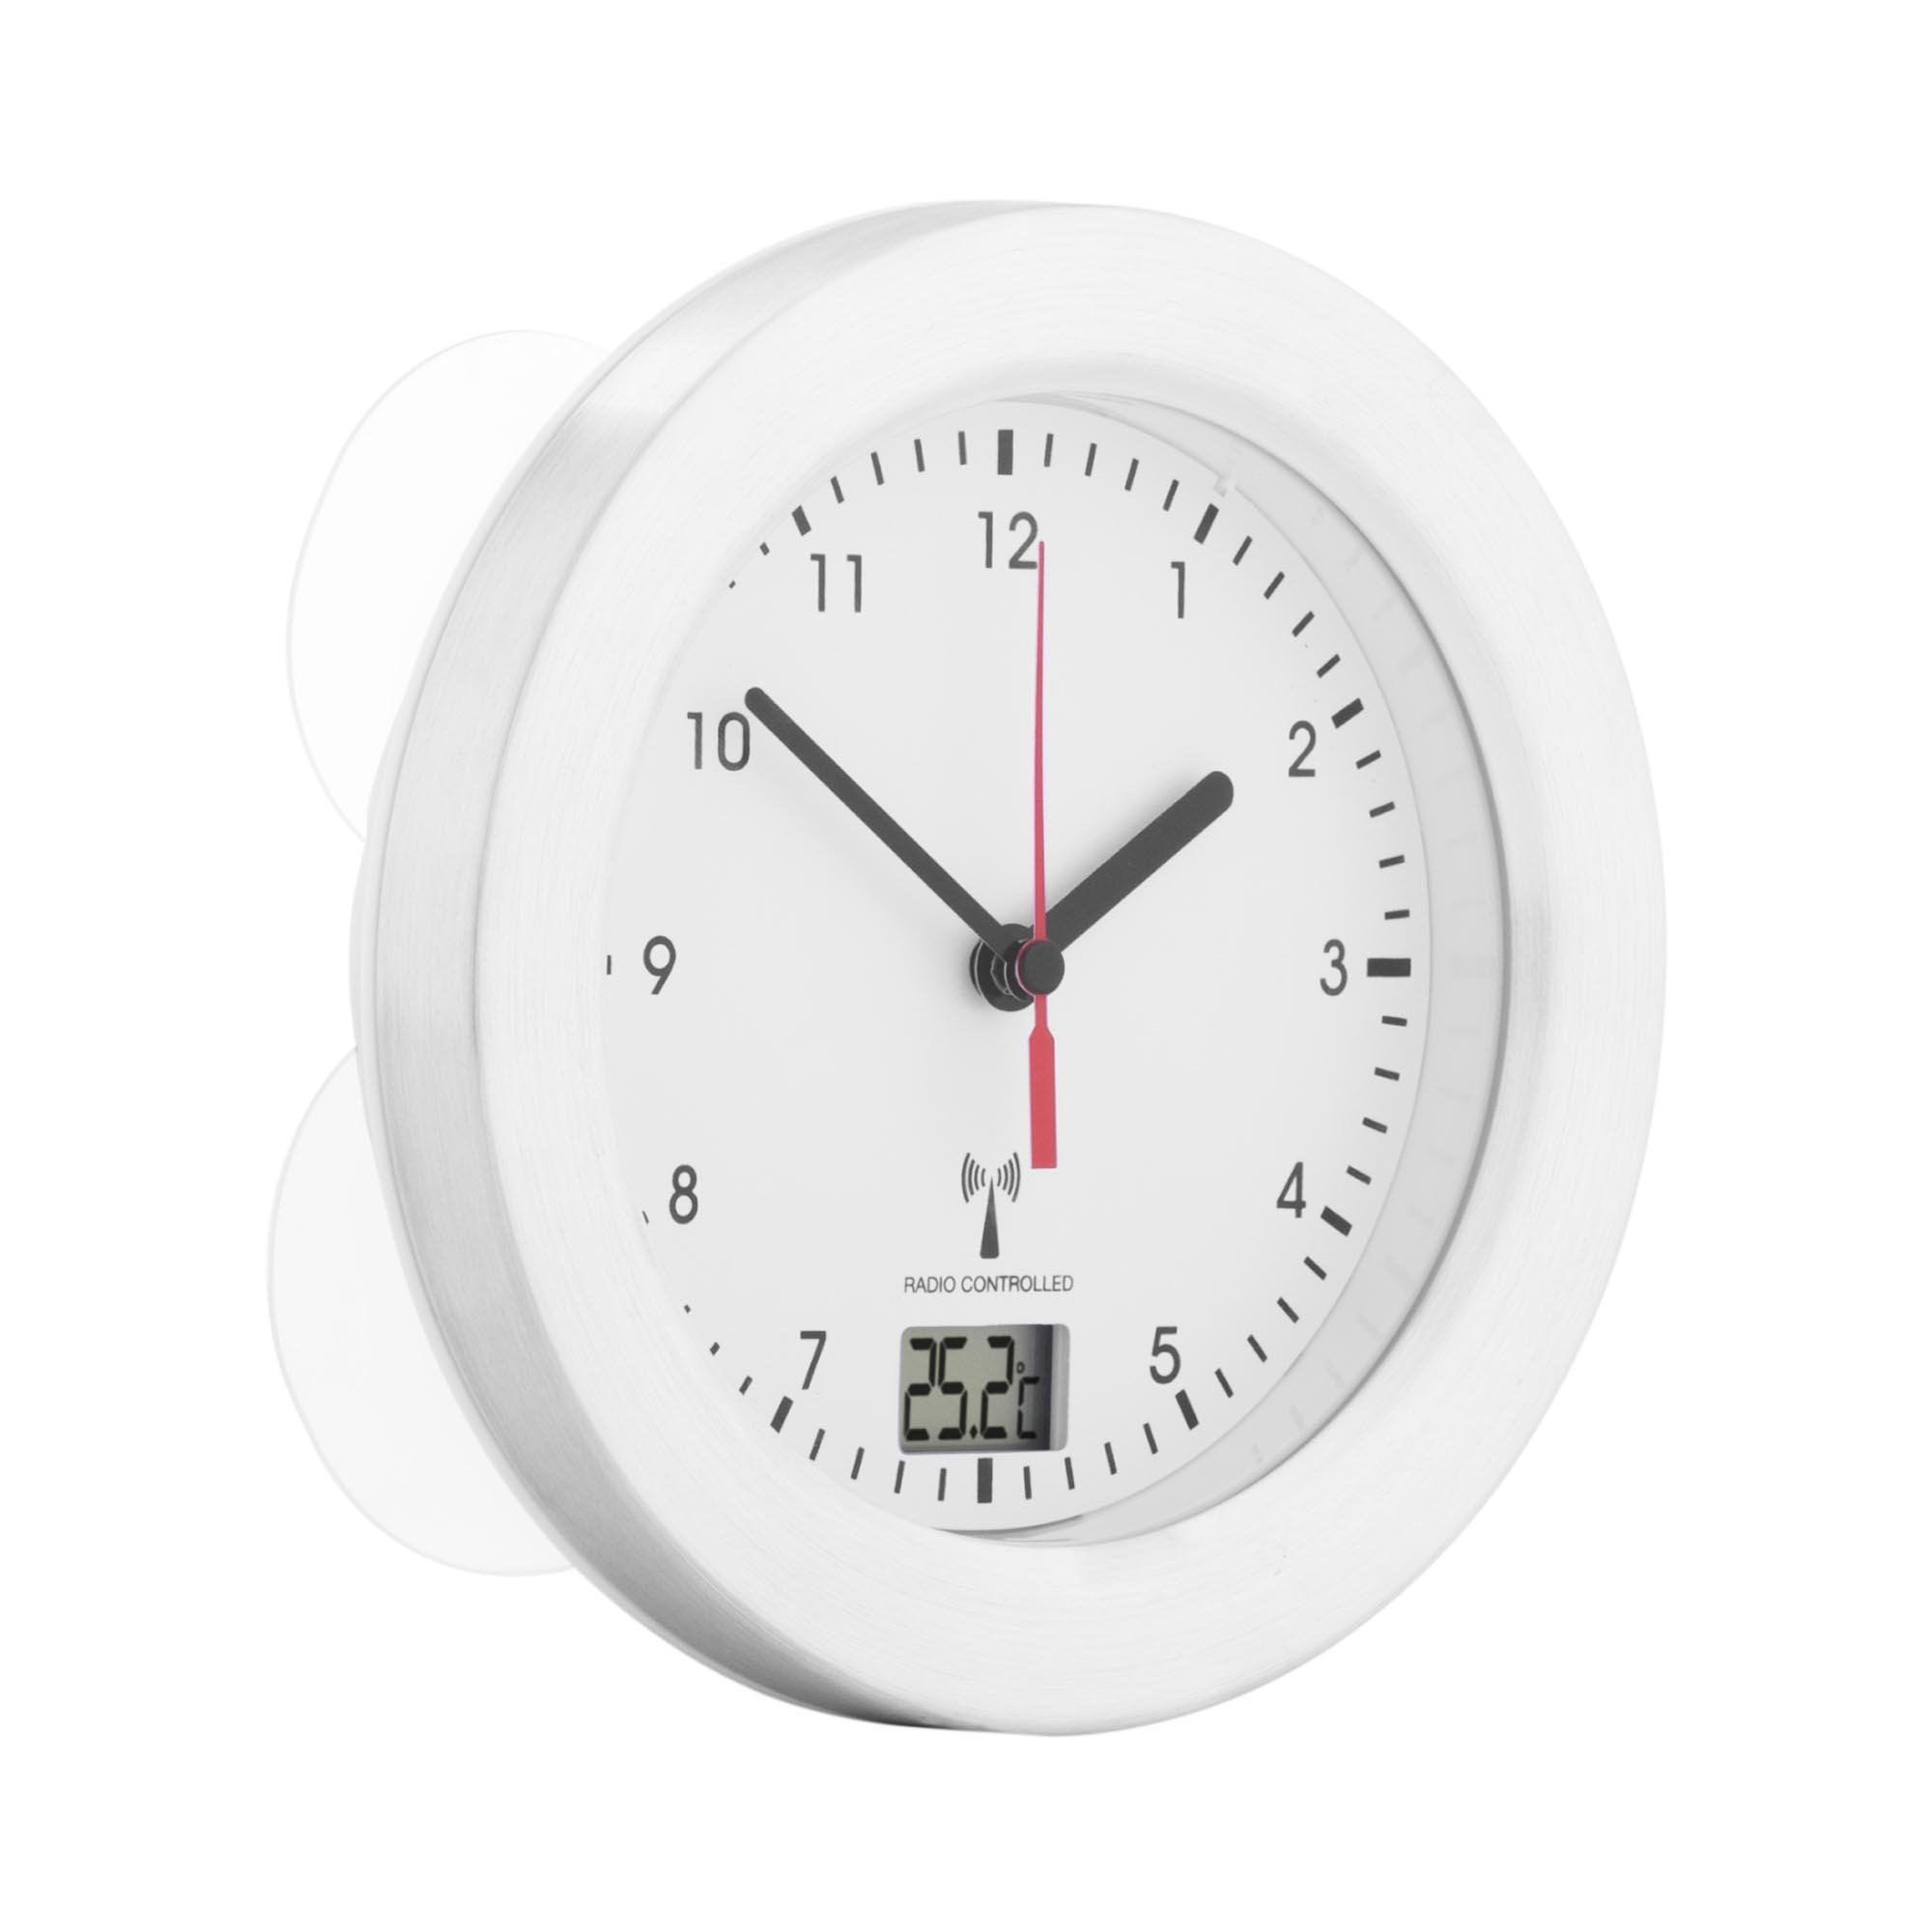 Uniprodo Badezimmeruhr - Funk - 17 cm 10250321